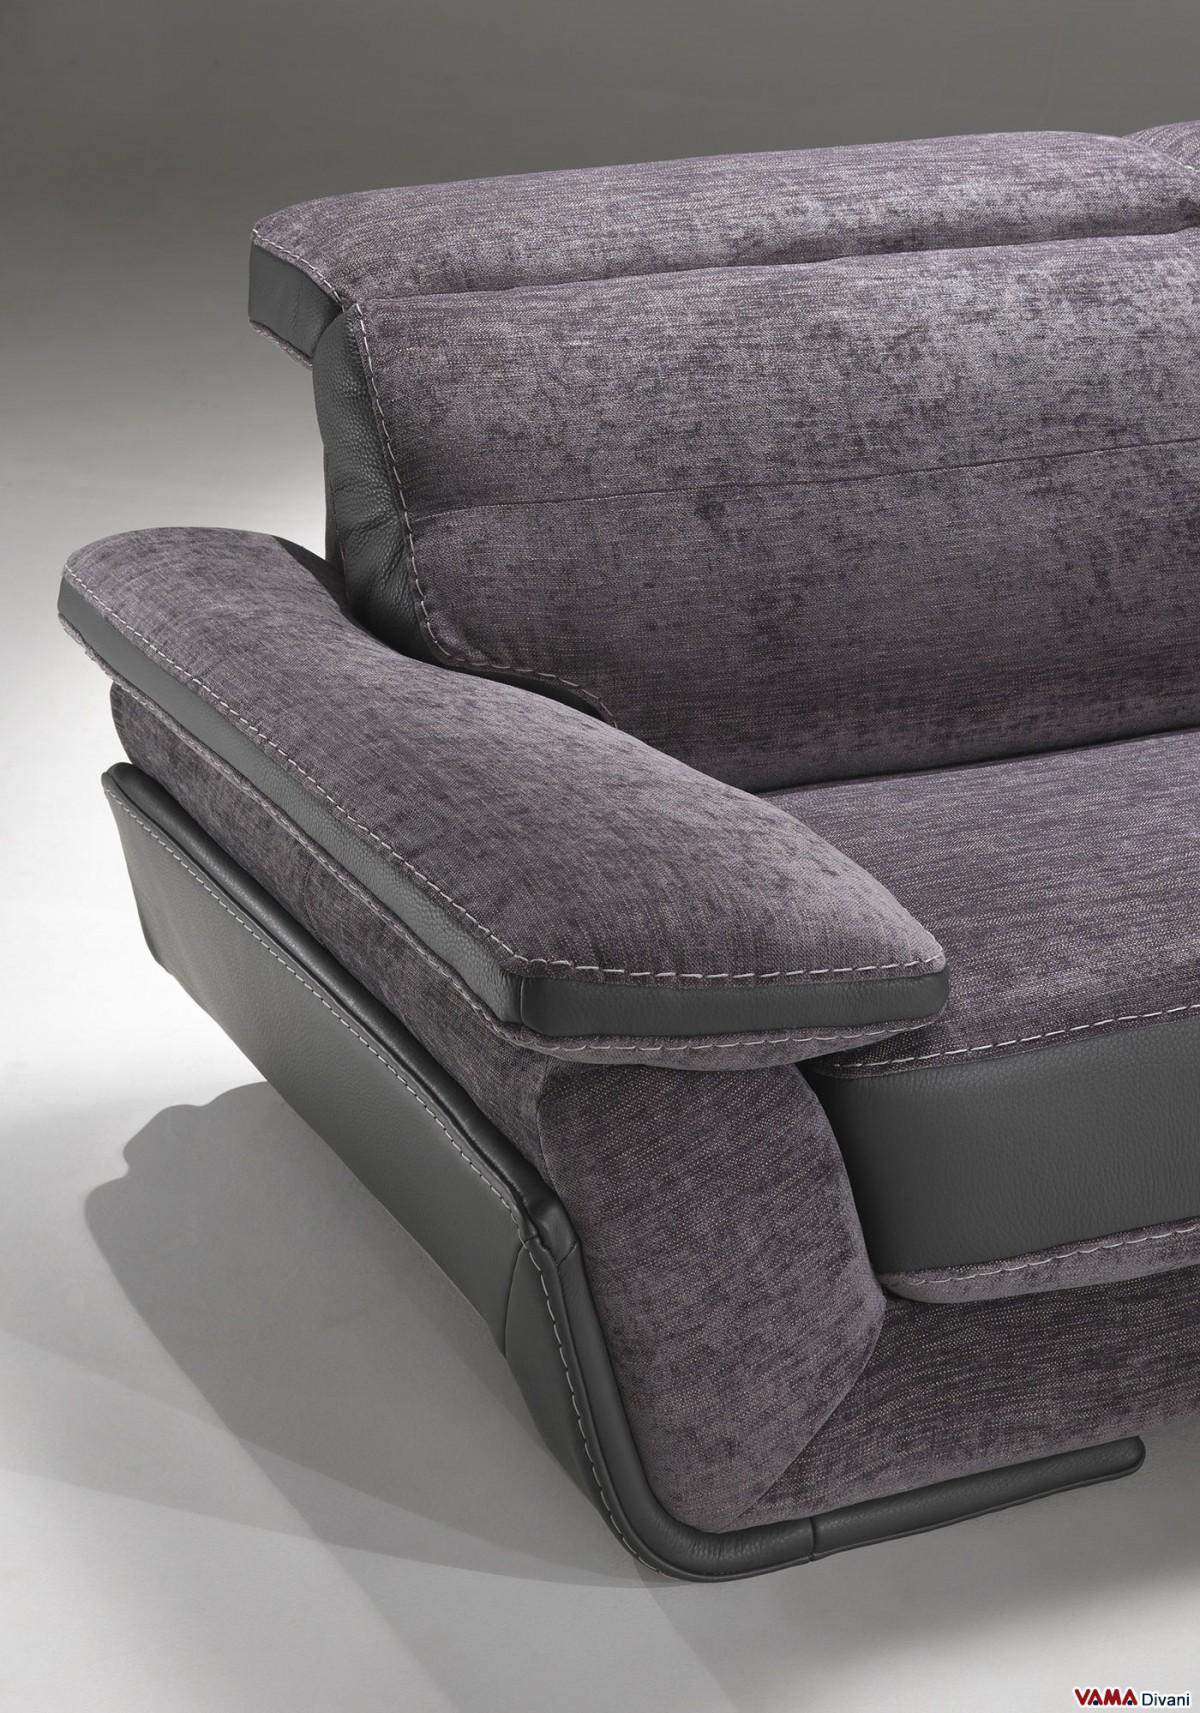 sofa headrest. contemporary fabric sofa with recliner headrests headrest